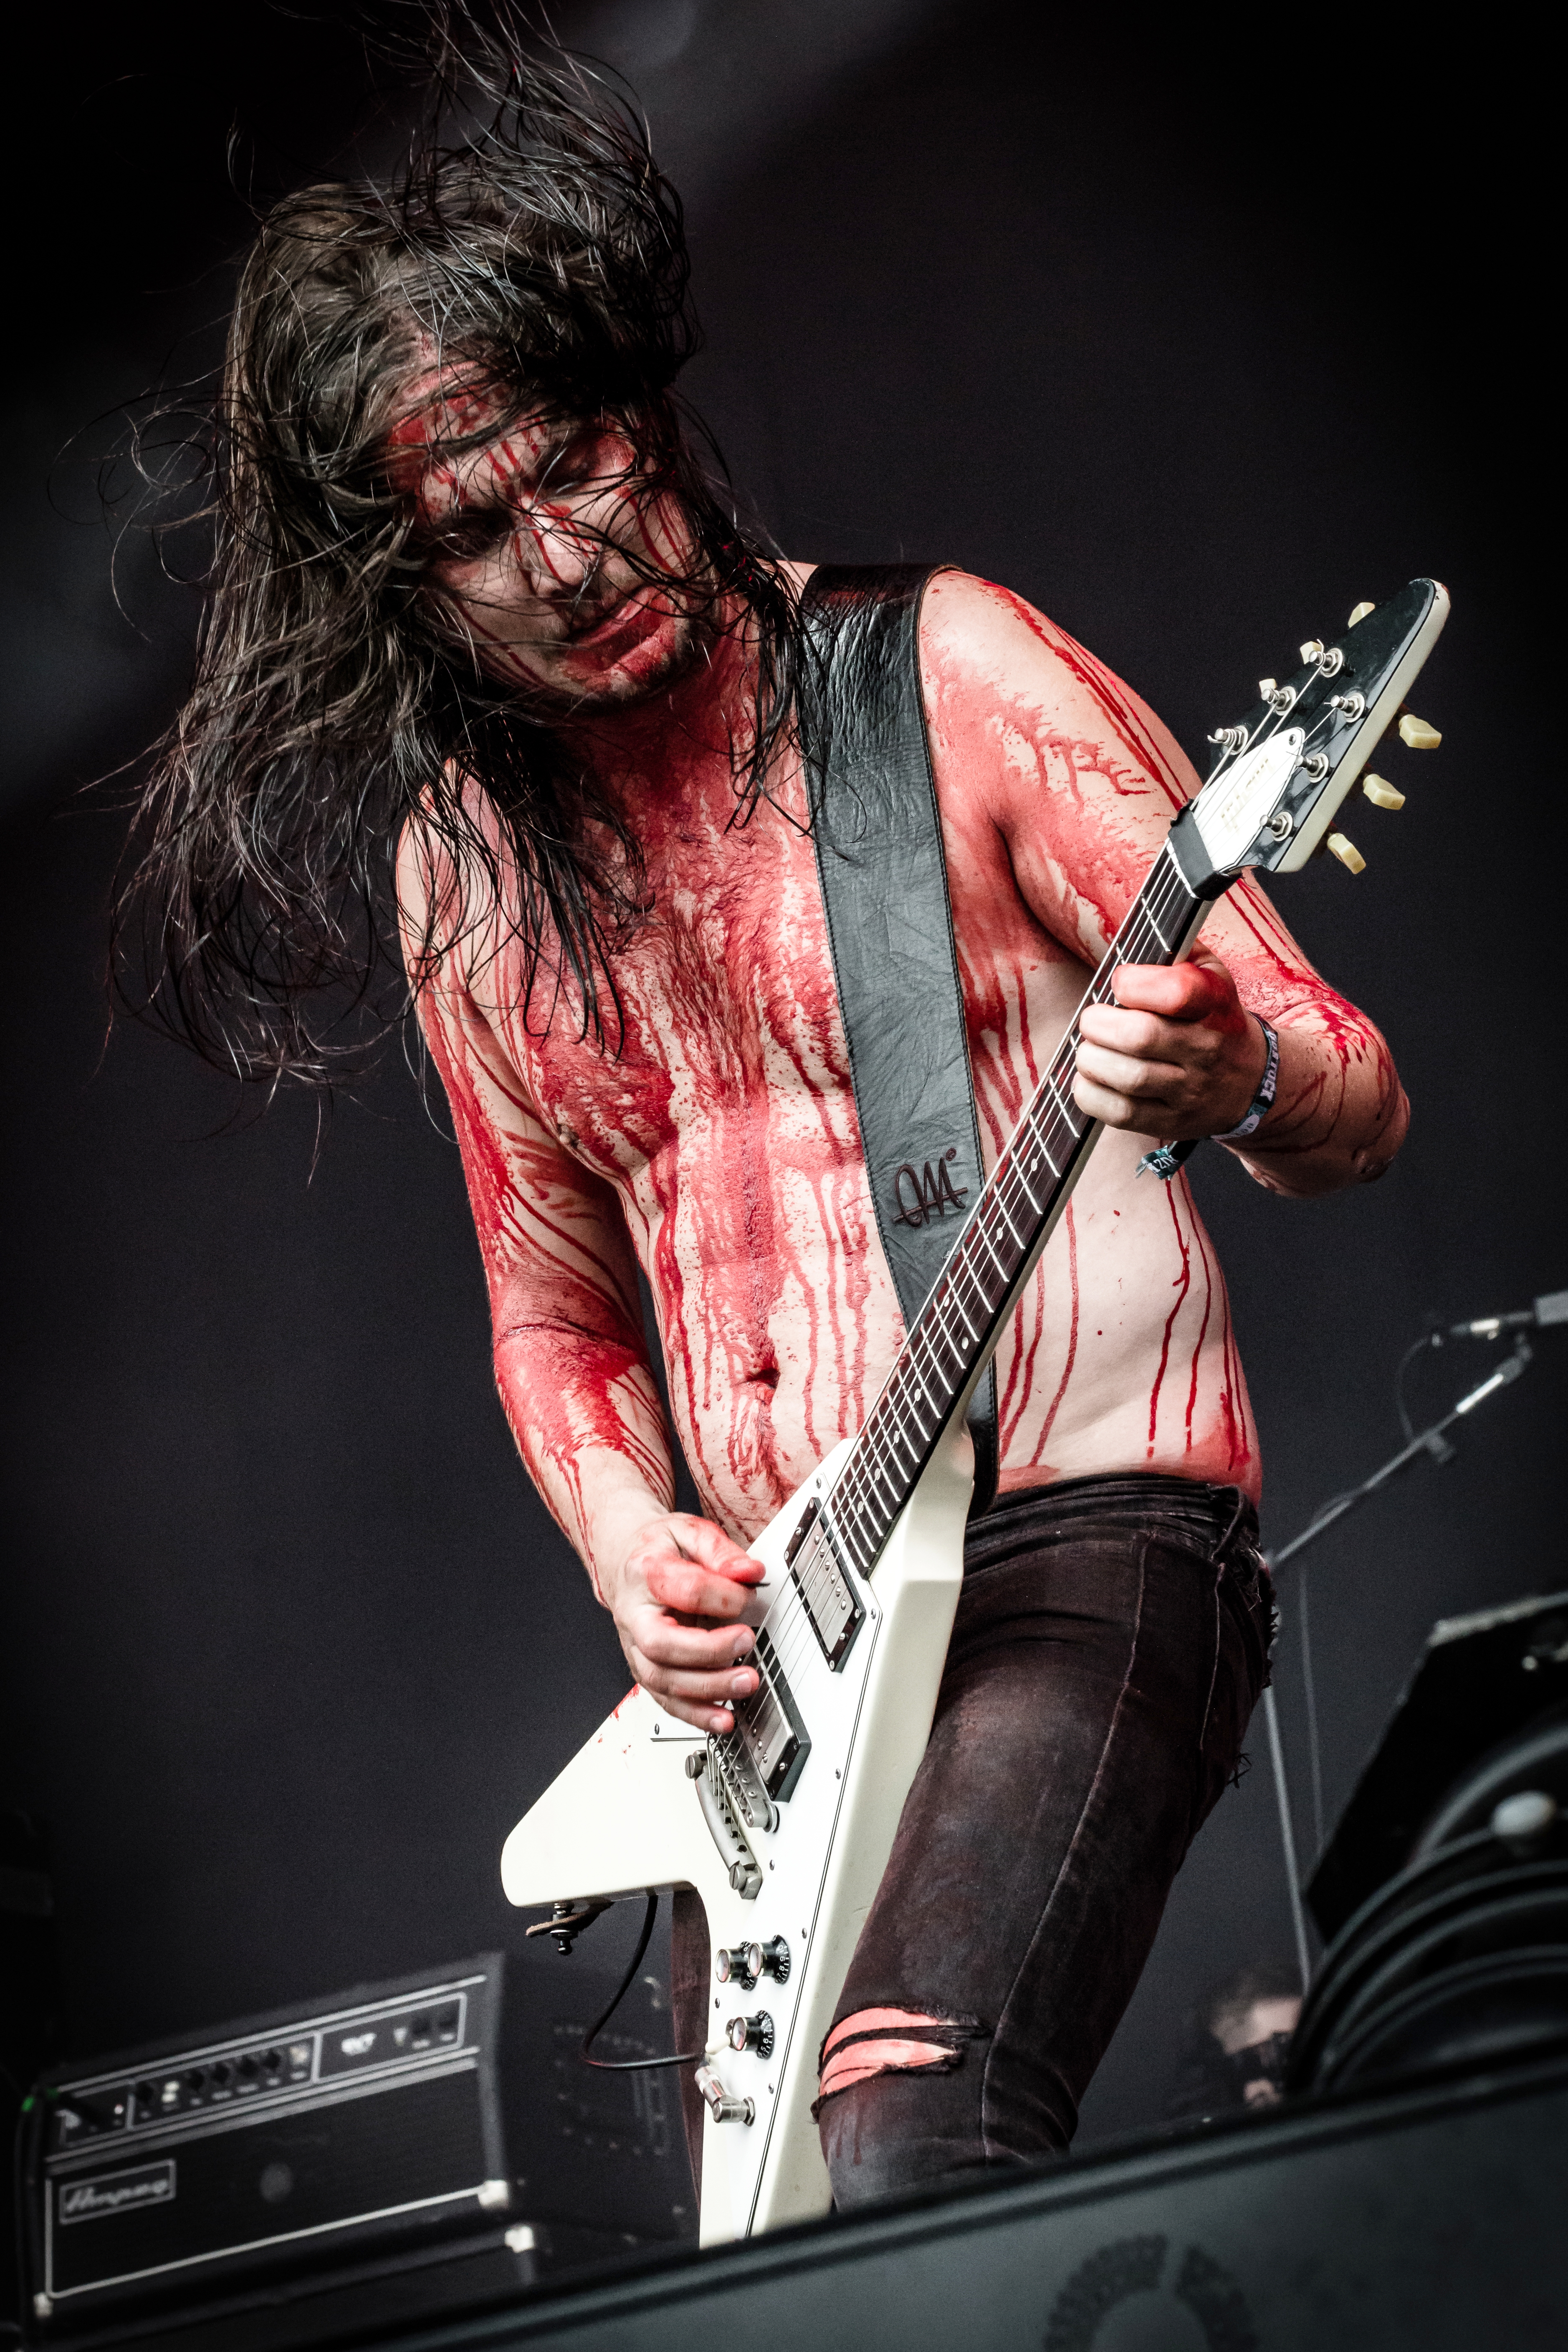 Bloodbath 3